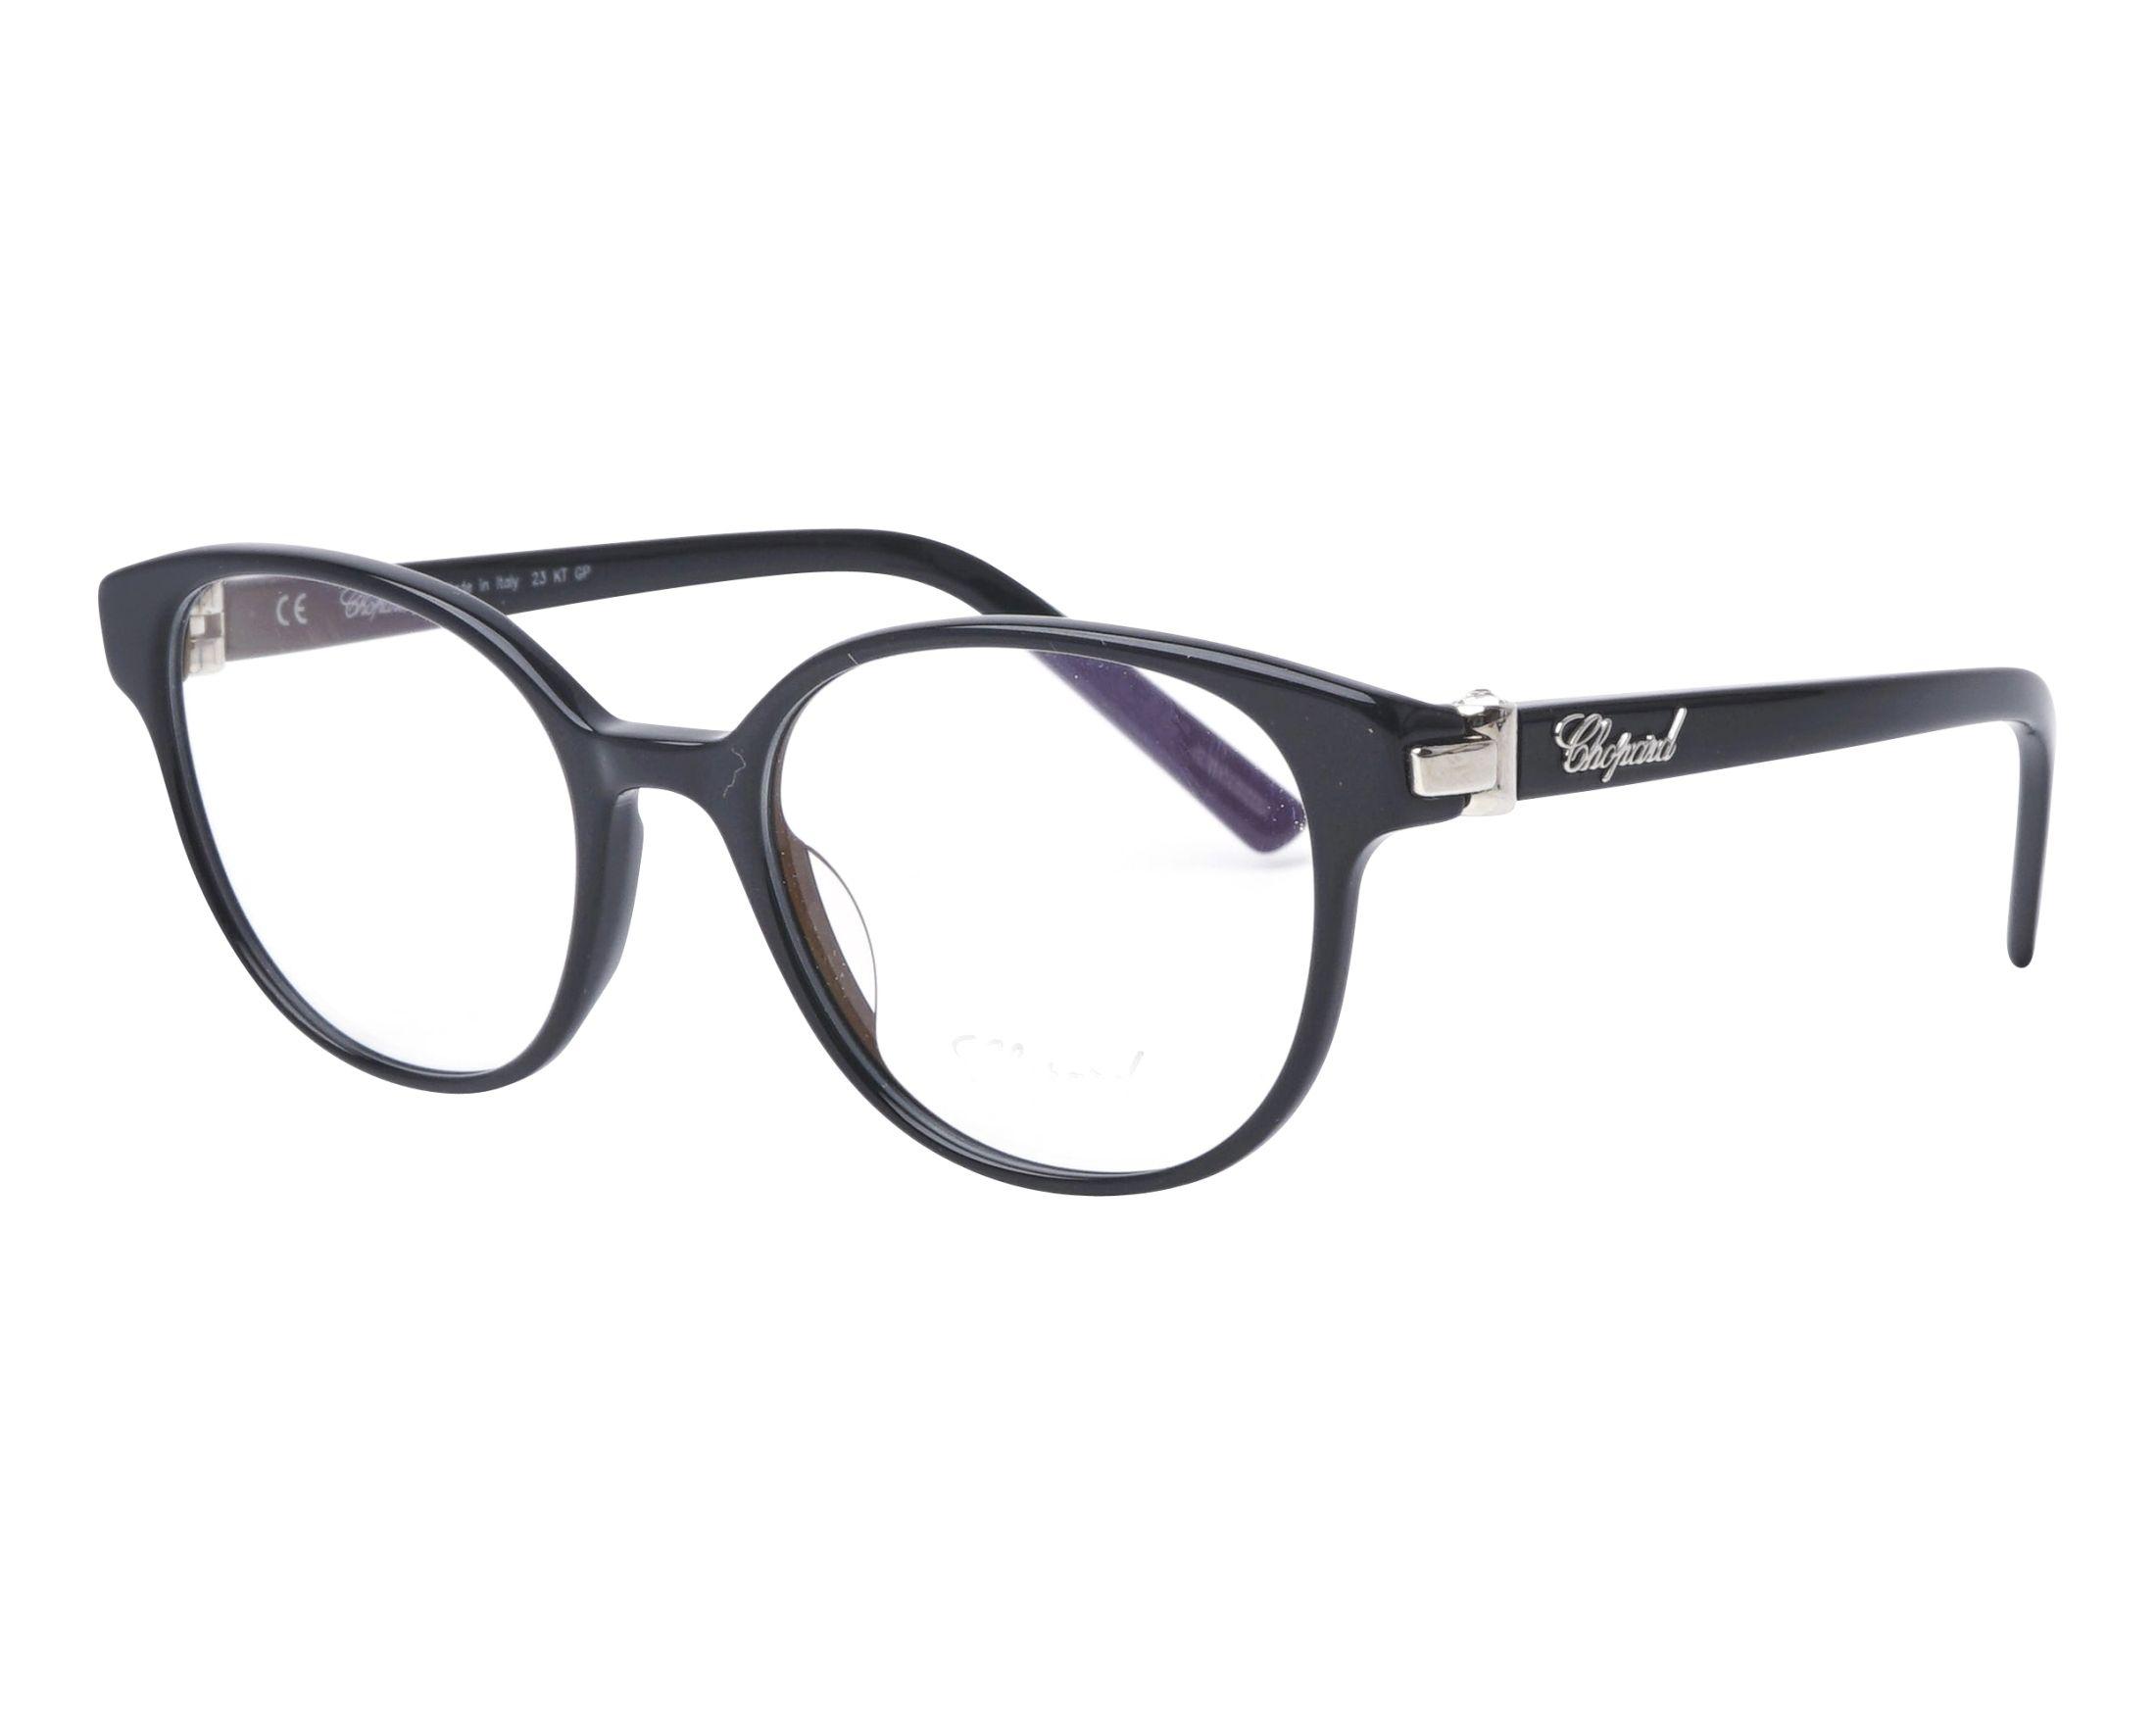 99dc3855a2c eyeglasses Chopard VCH-198-G 0700 51-19 Black profile view